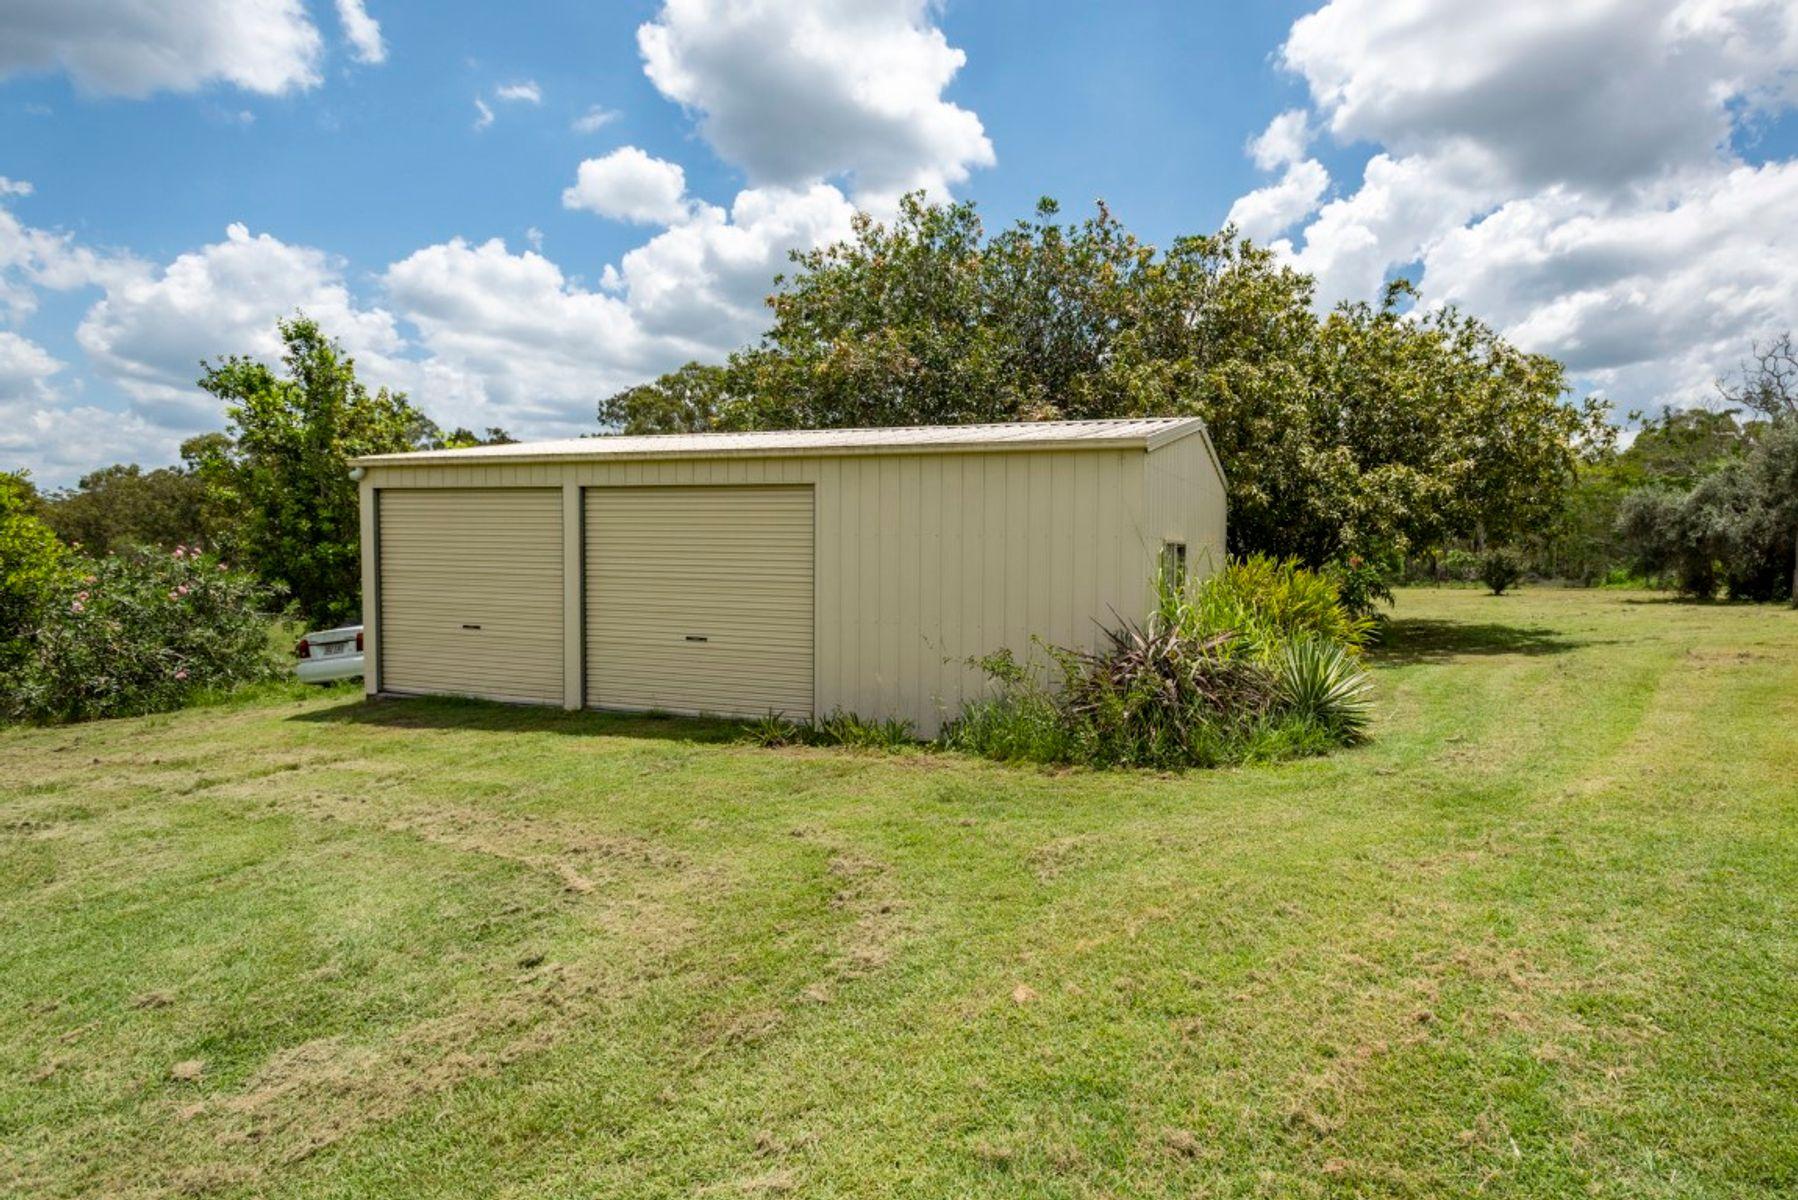 174 Oyster Creek Road, Oyster Creek, QLD 4674